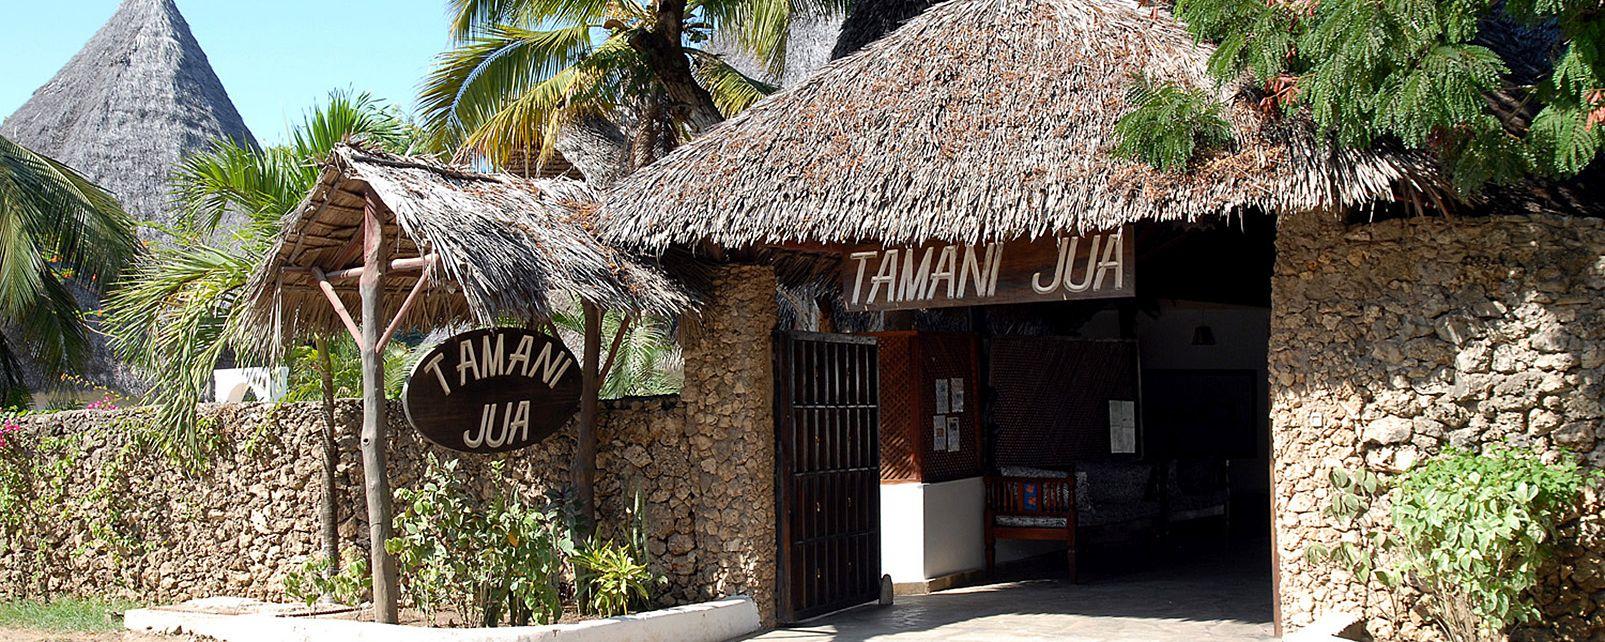 Hôtel Tamani Jua